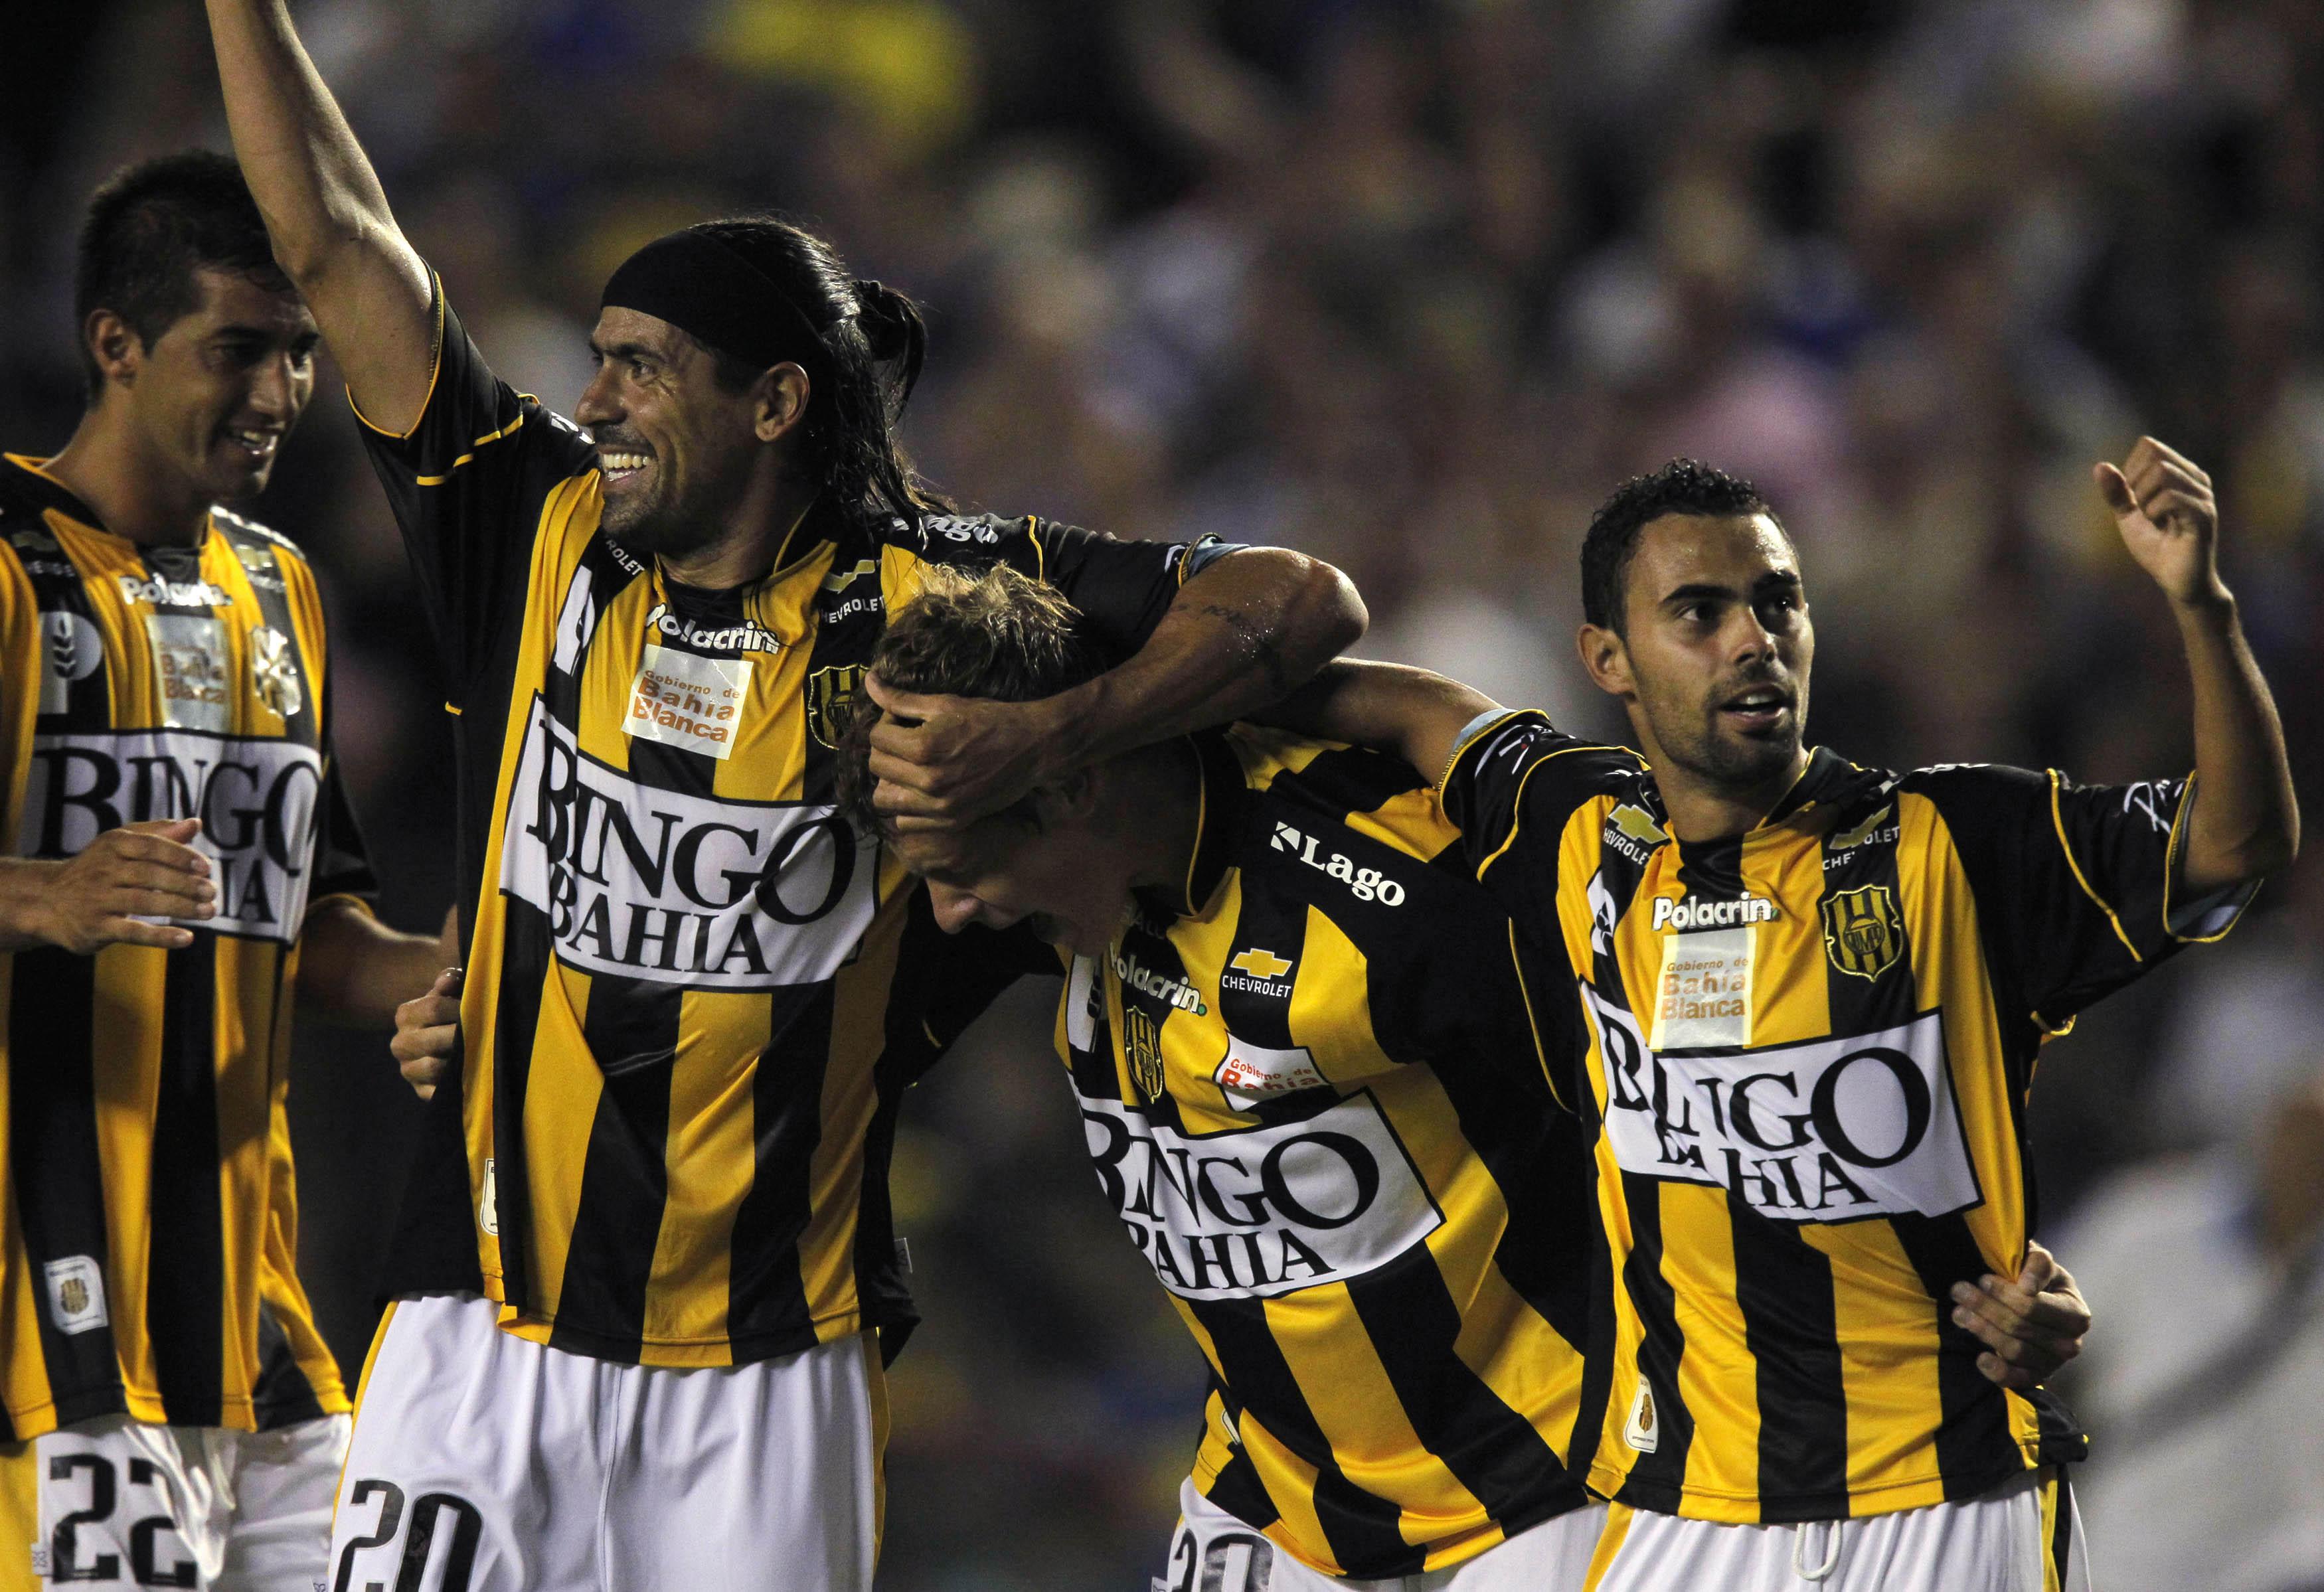 Copa Argentina venerdì 20 luglio